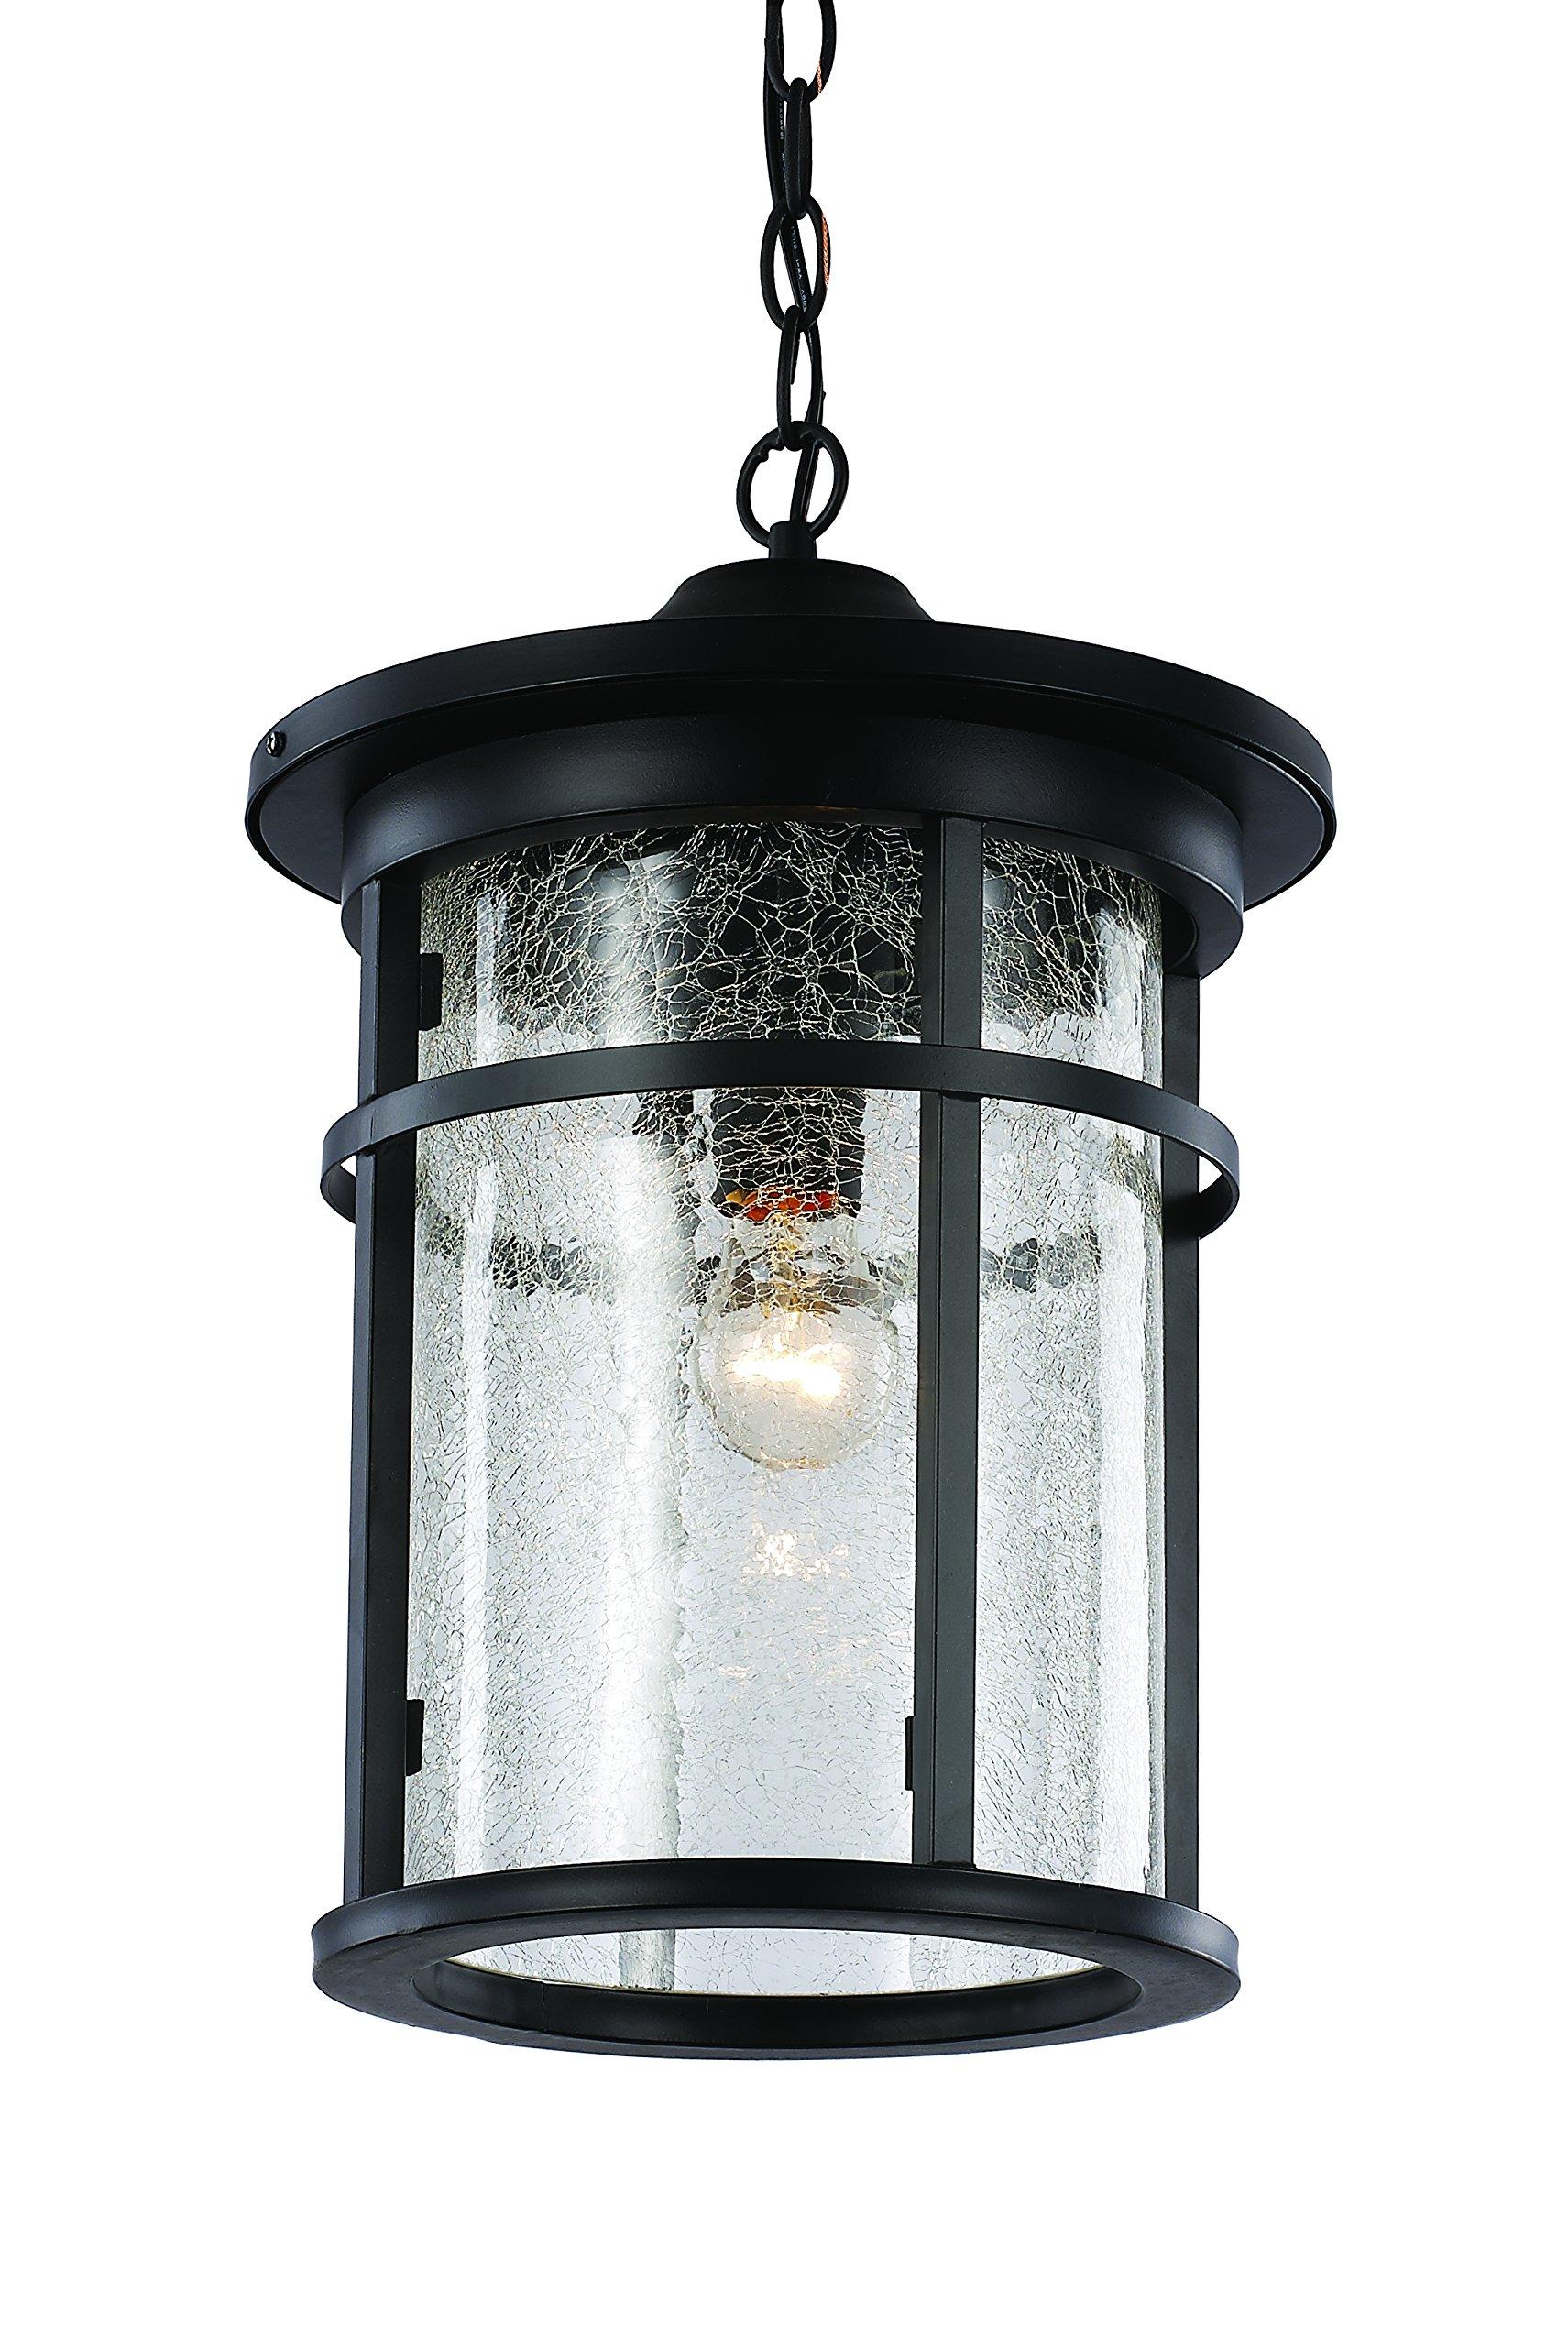 Trans Globe Lighting 40386 BK Outdoor Avalon 16'' Hanging Lantern, Black